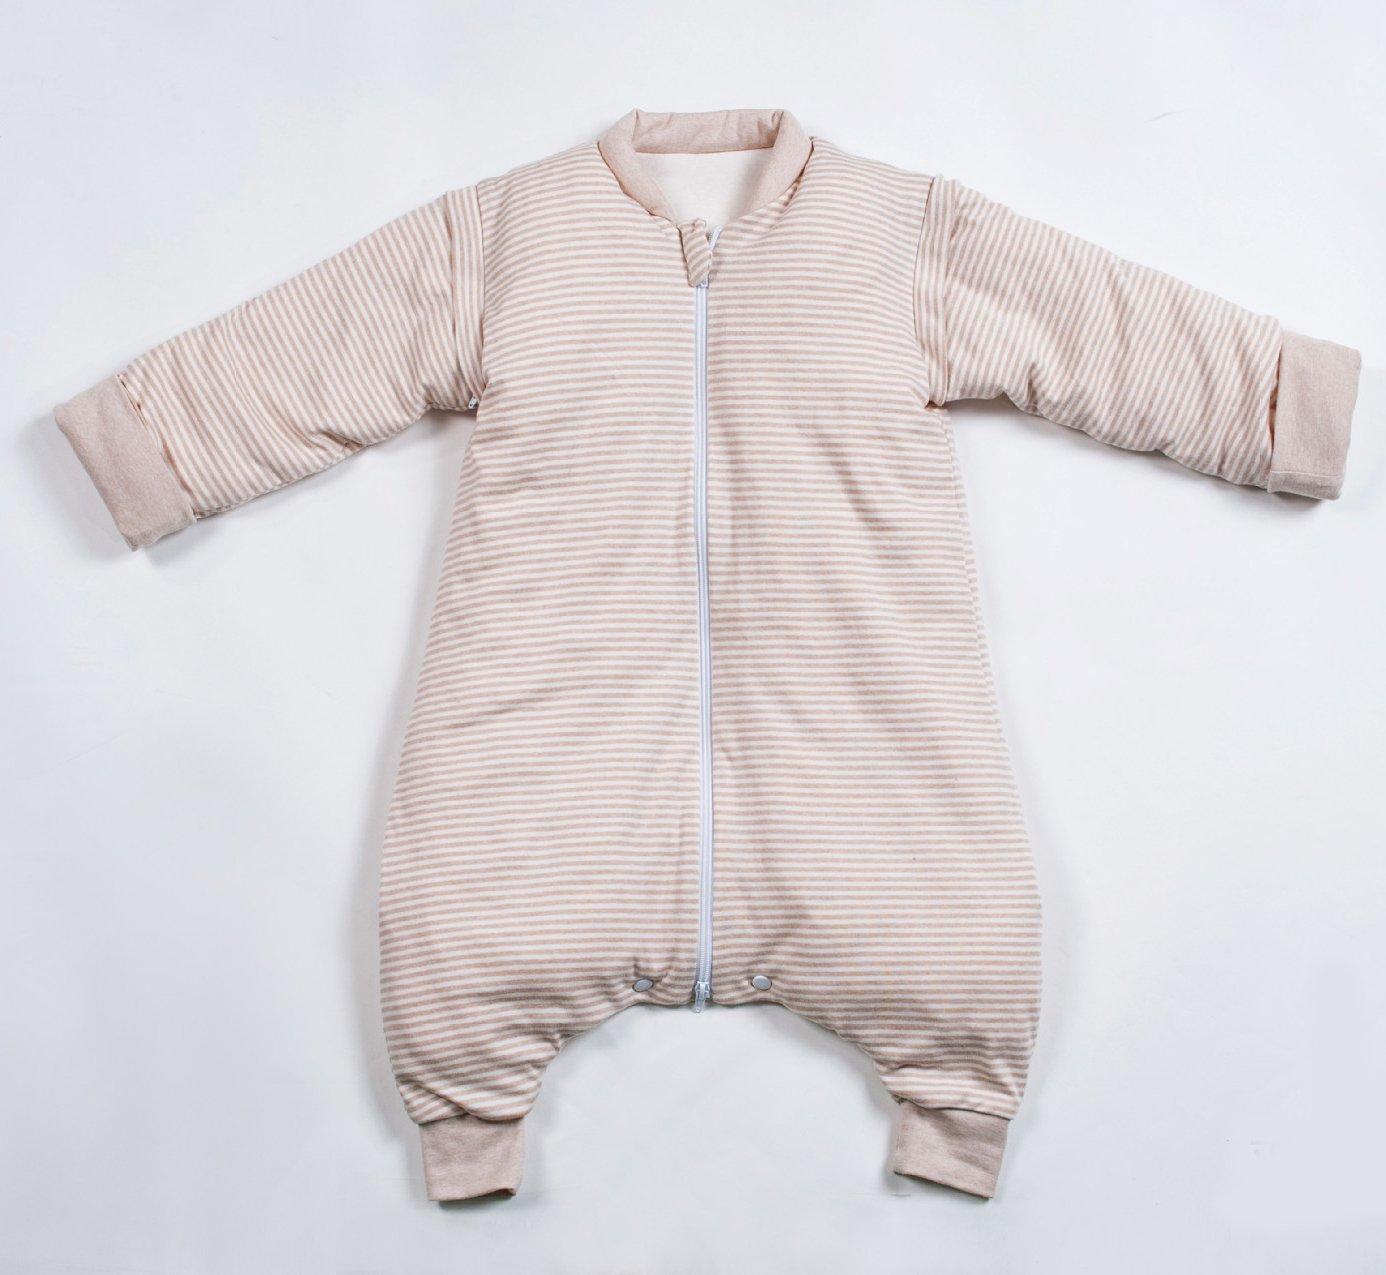 Silk SleepSacks Baby Sleeping Bag Kids' Sleep Nest (1.8'-3')